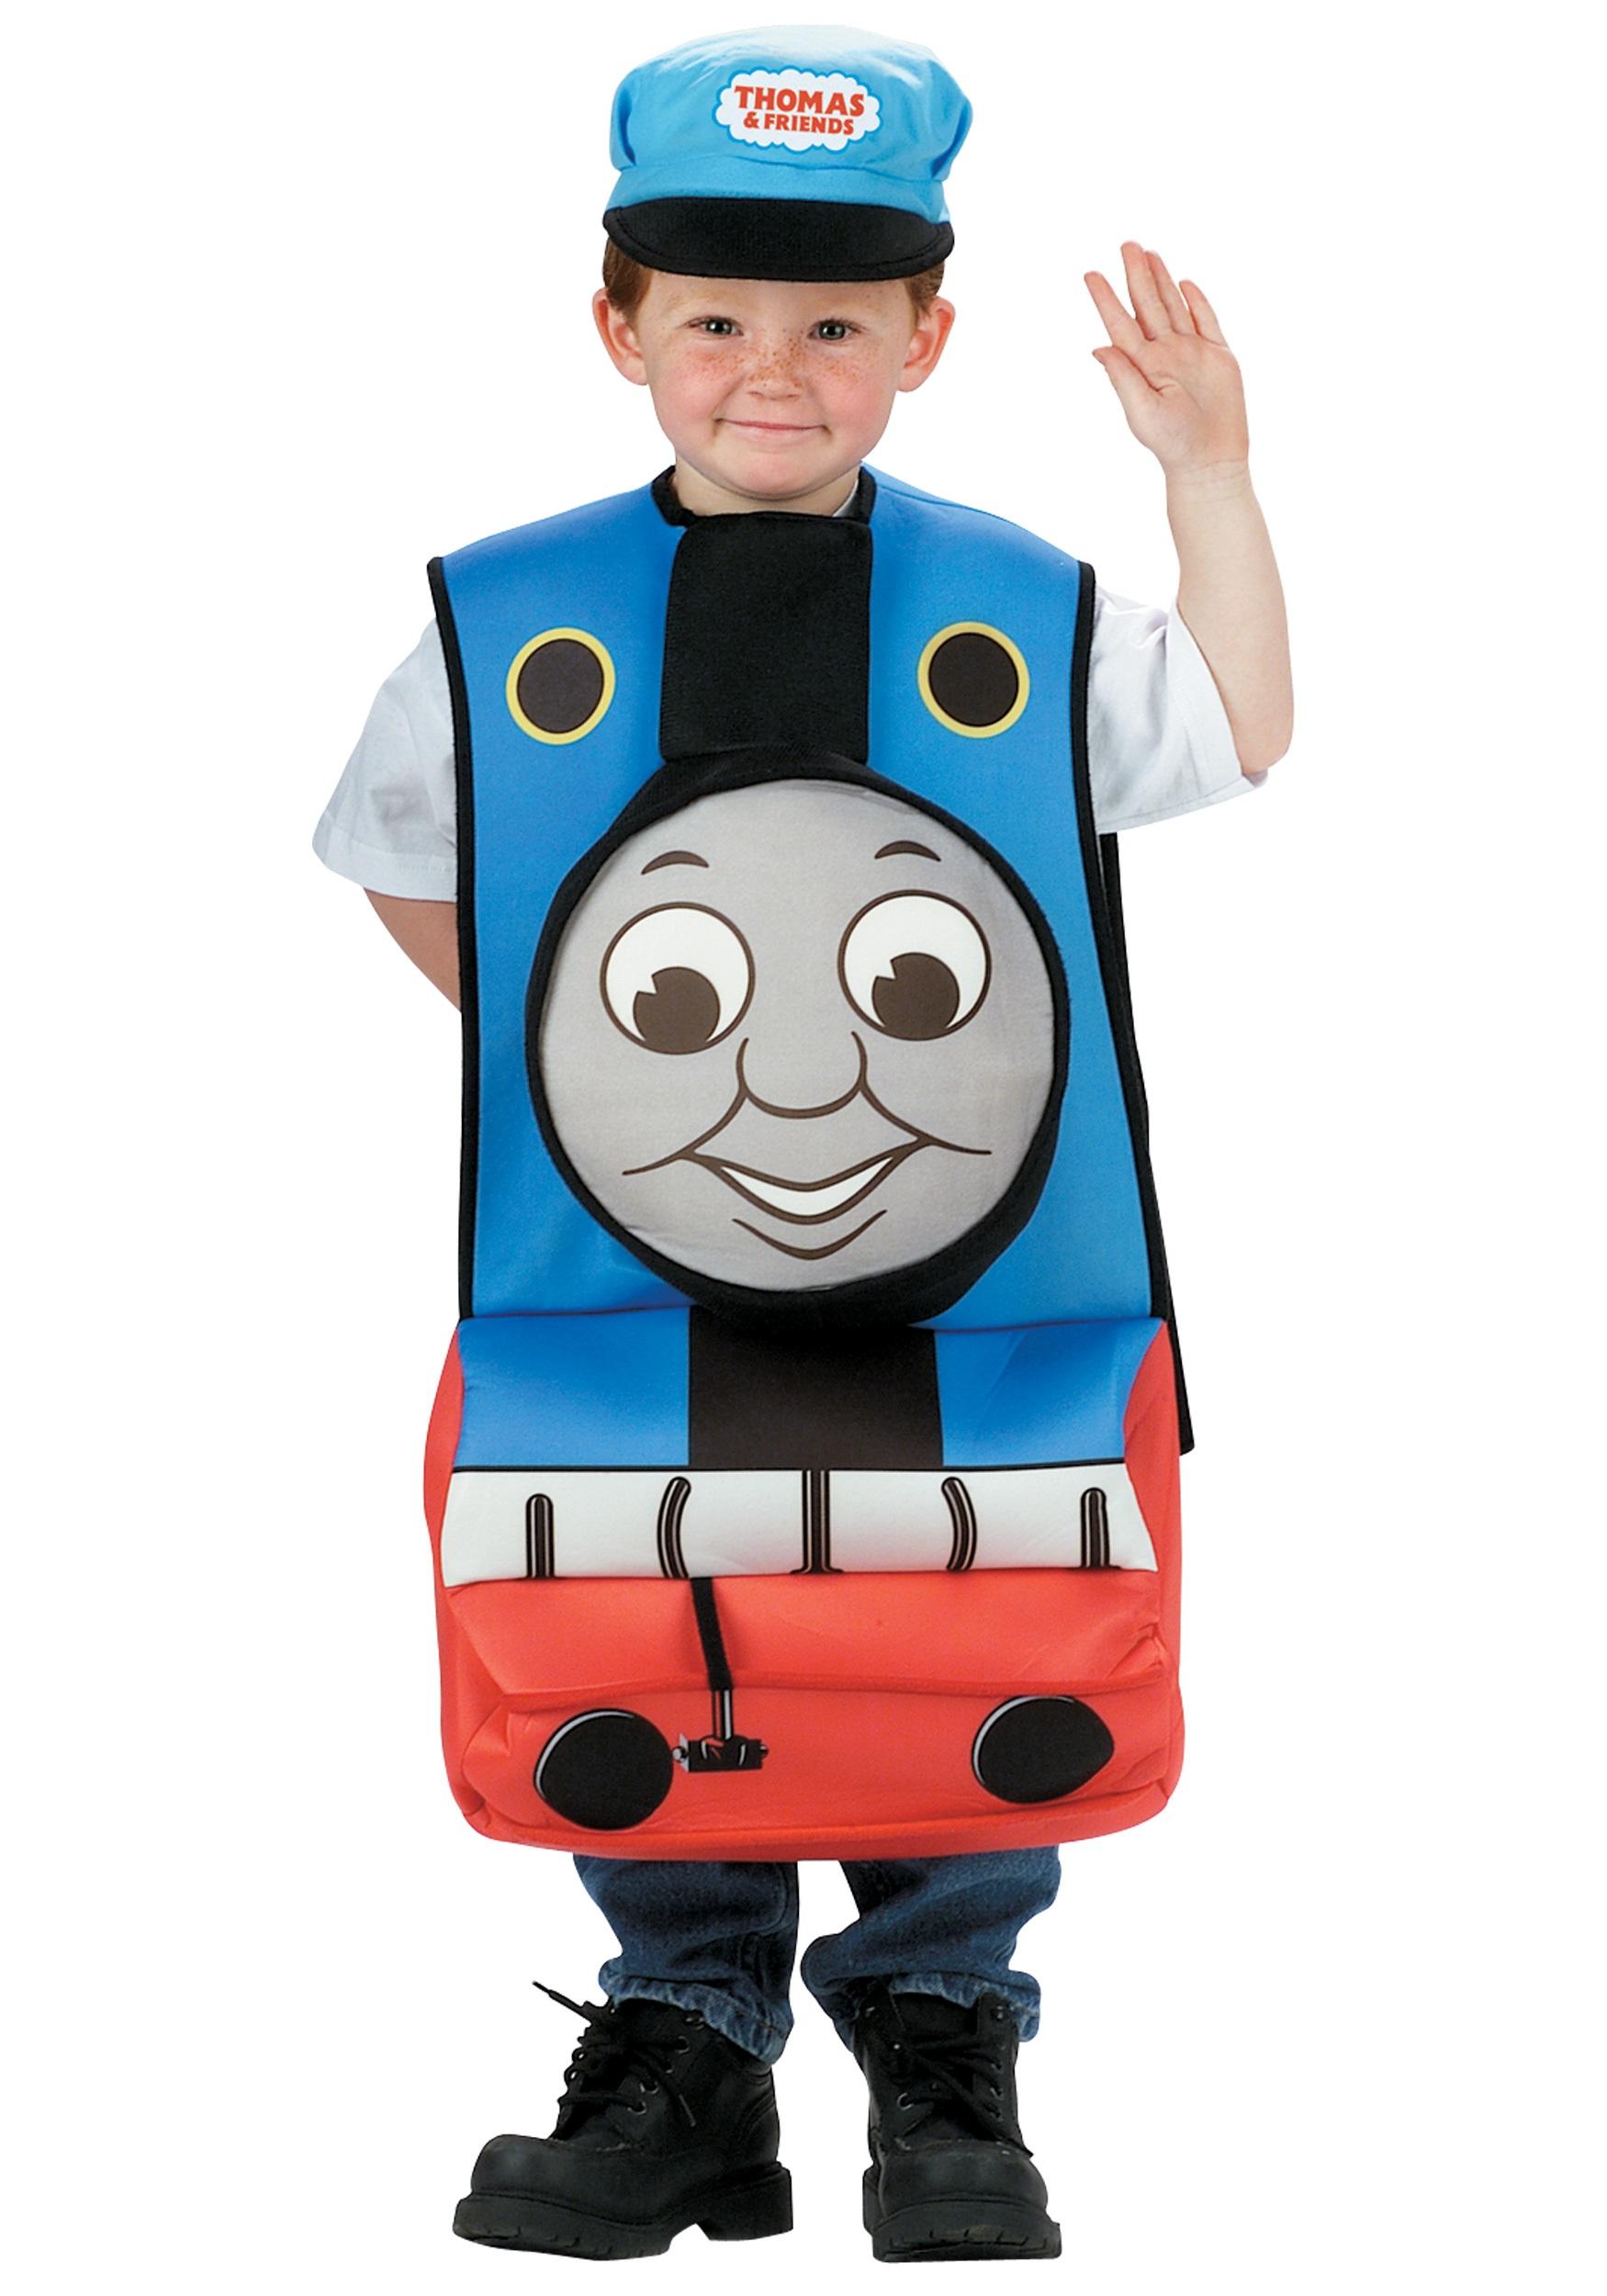 Kids Thomas the Tank Engine Costume  sc 1 st  Halloween Costumes & Kids Thomas the Tank Engine Costume - Halloween Costumes